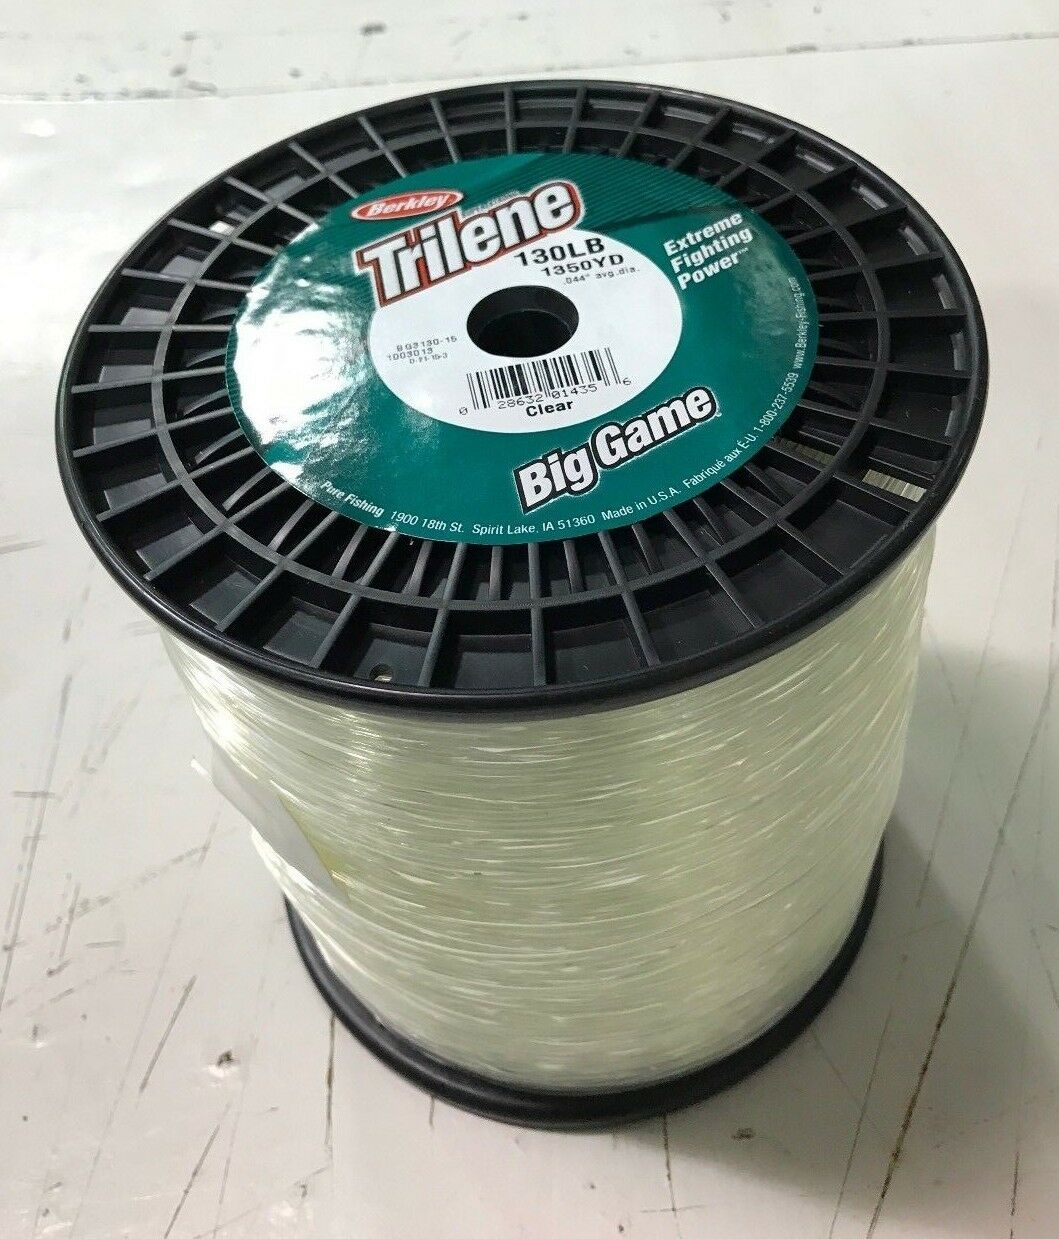 Trilene Big Game 130lb test 3lb Spool (BG3130-15)